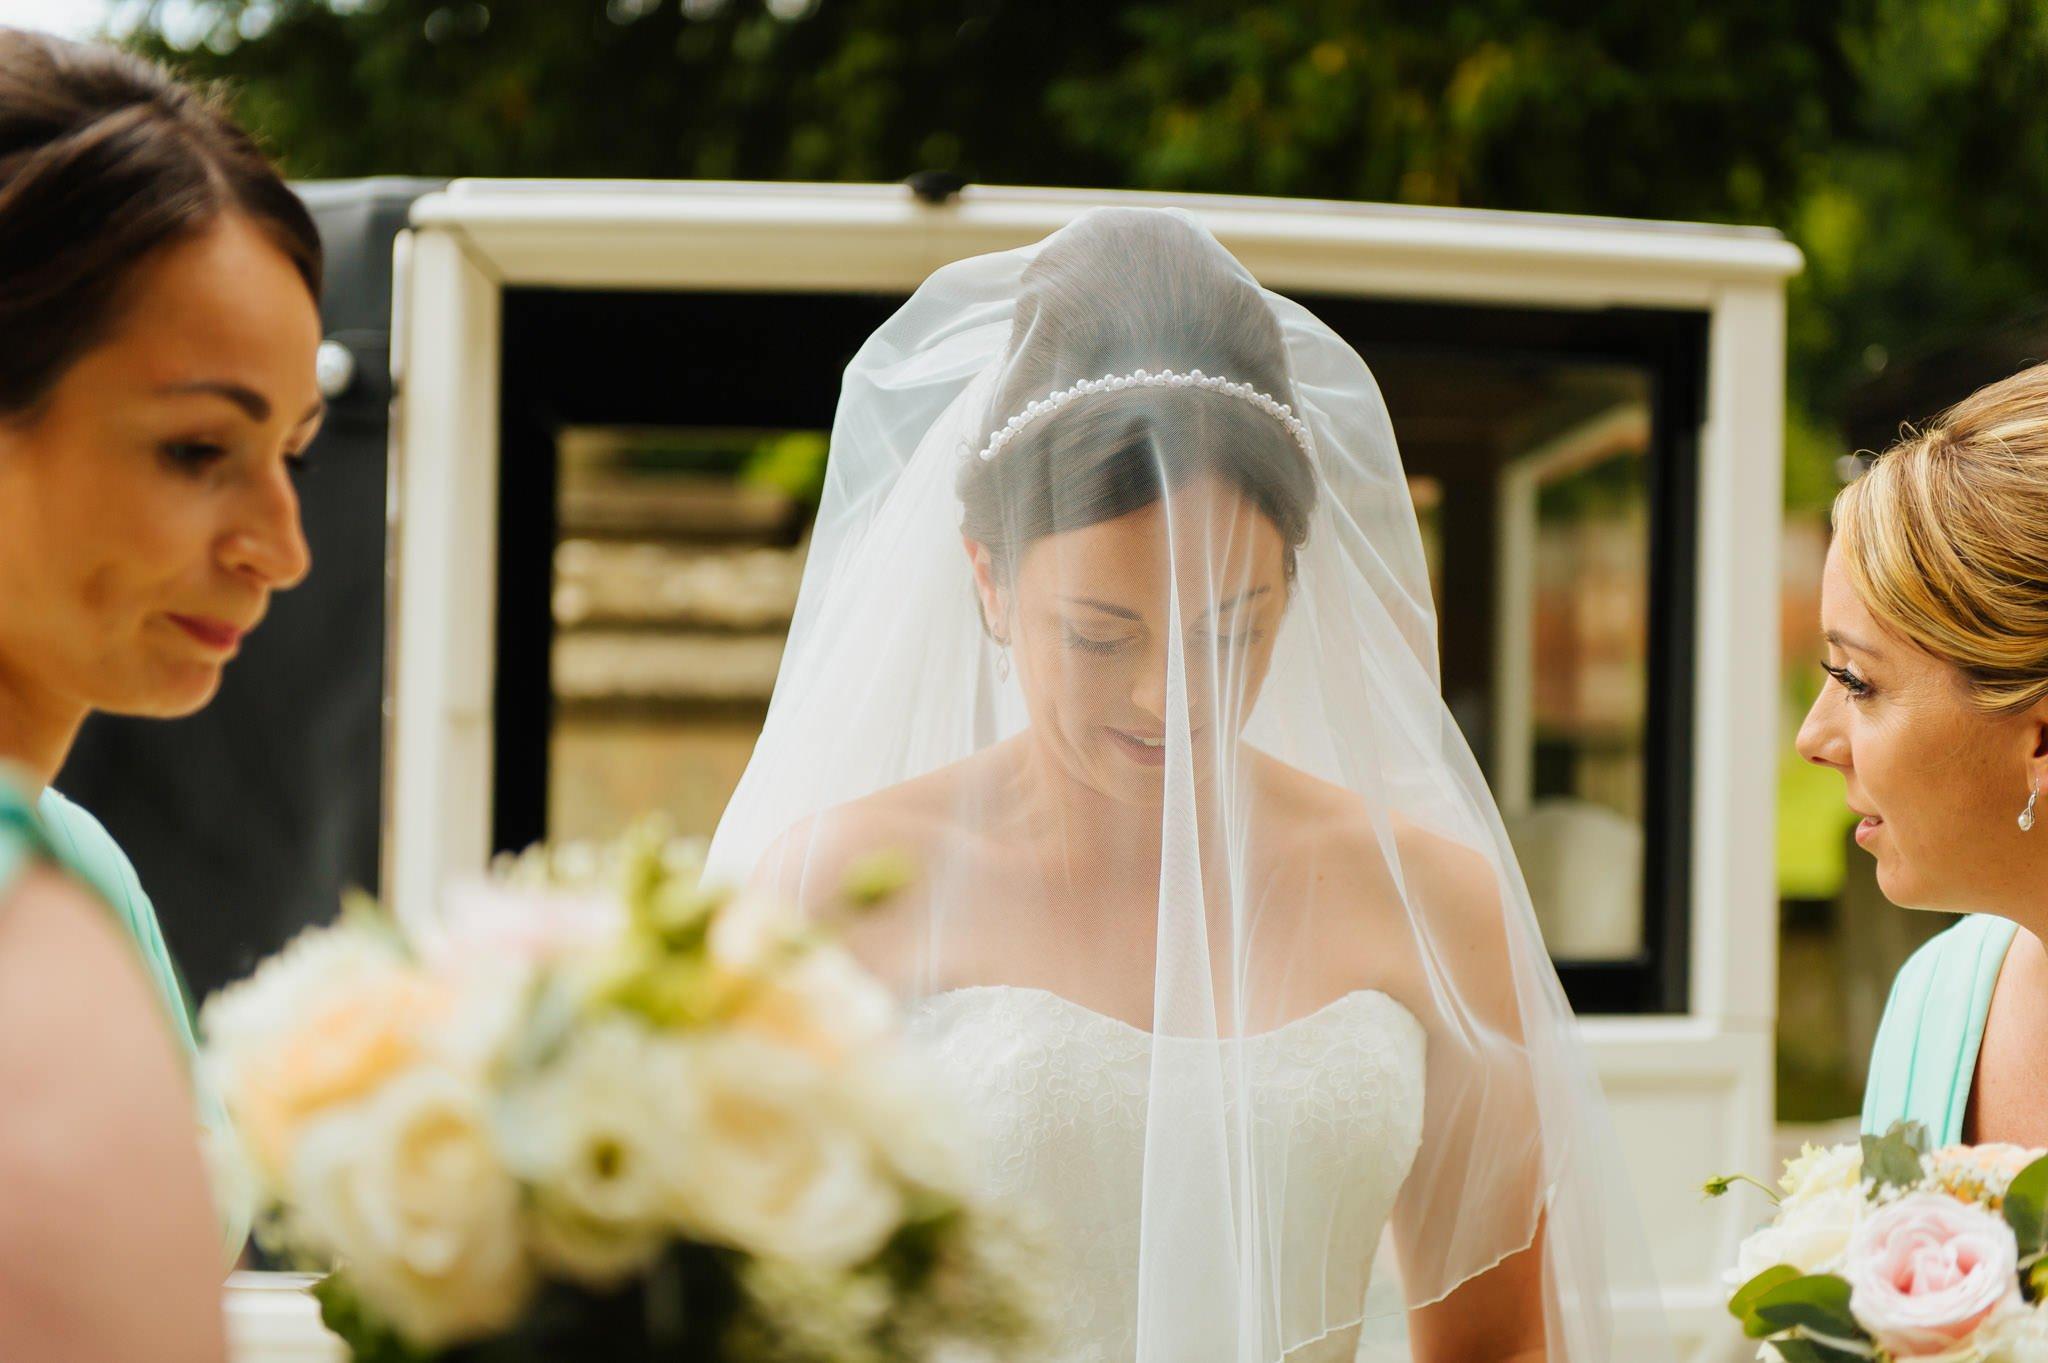 Eastnor Castle wedding photographer Herefordshire, West Midlands - Sarah + Dean 24